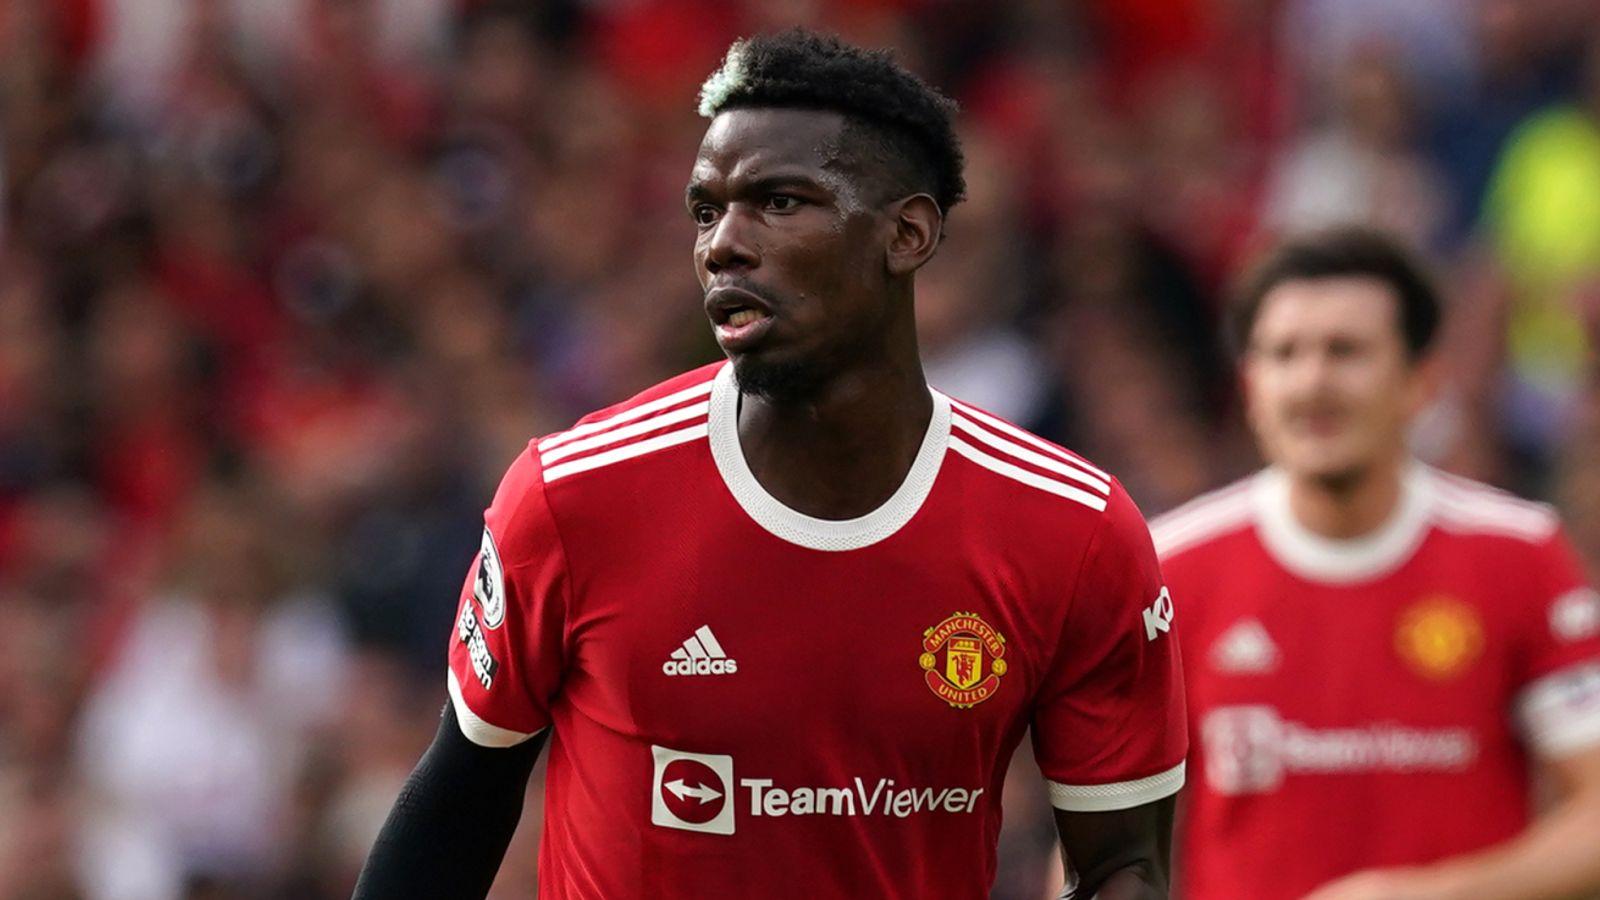 Paul Pogba: Manchester United midfielder could rejoin Juventus next summer, says agent Mino Raiola